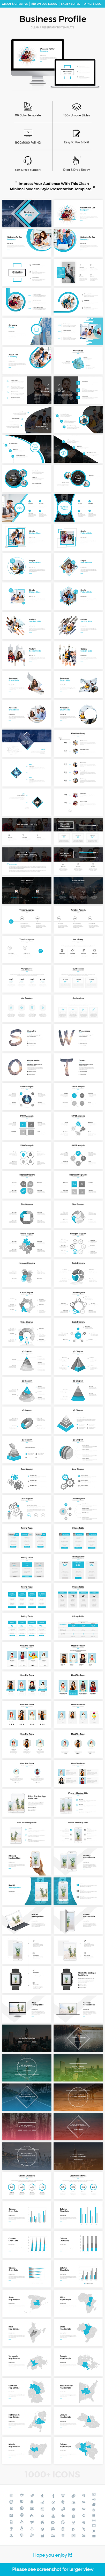 Business Profile Keynote Template 2018 - Business Keynote Templates